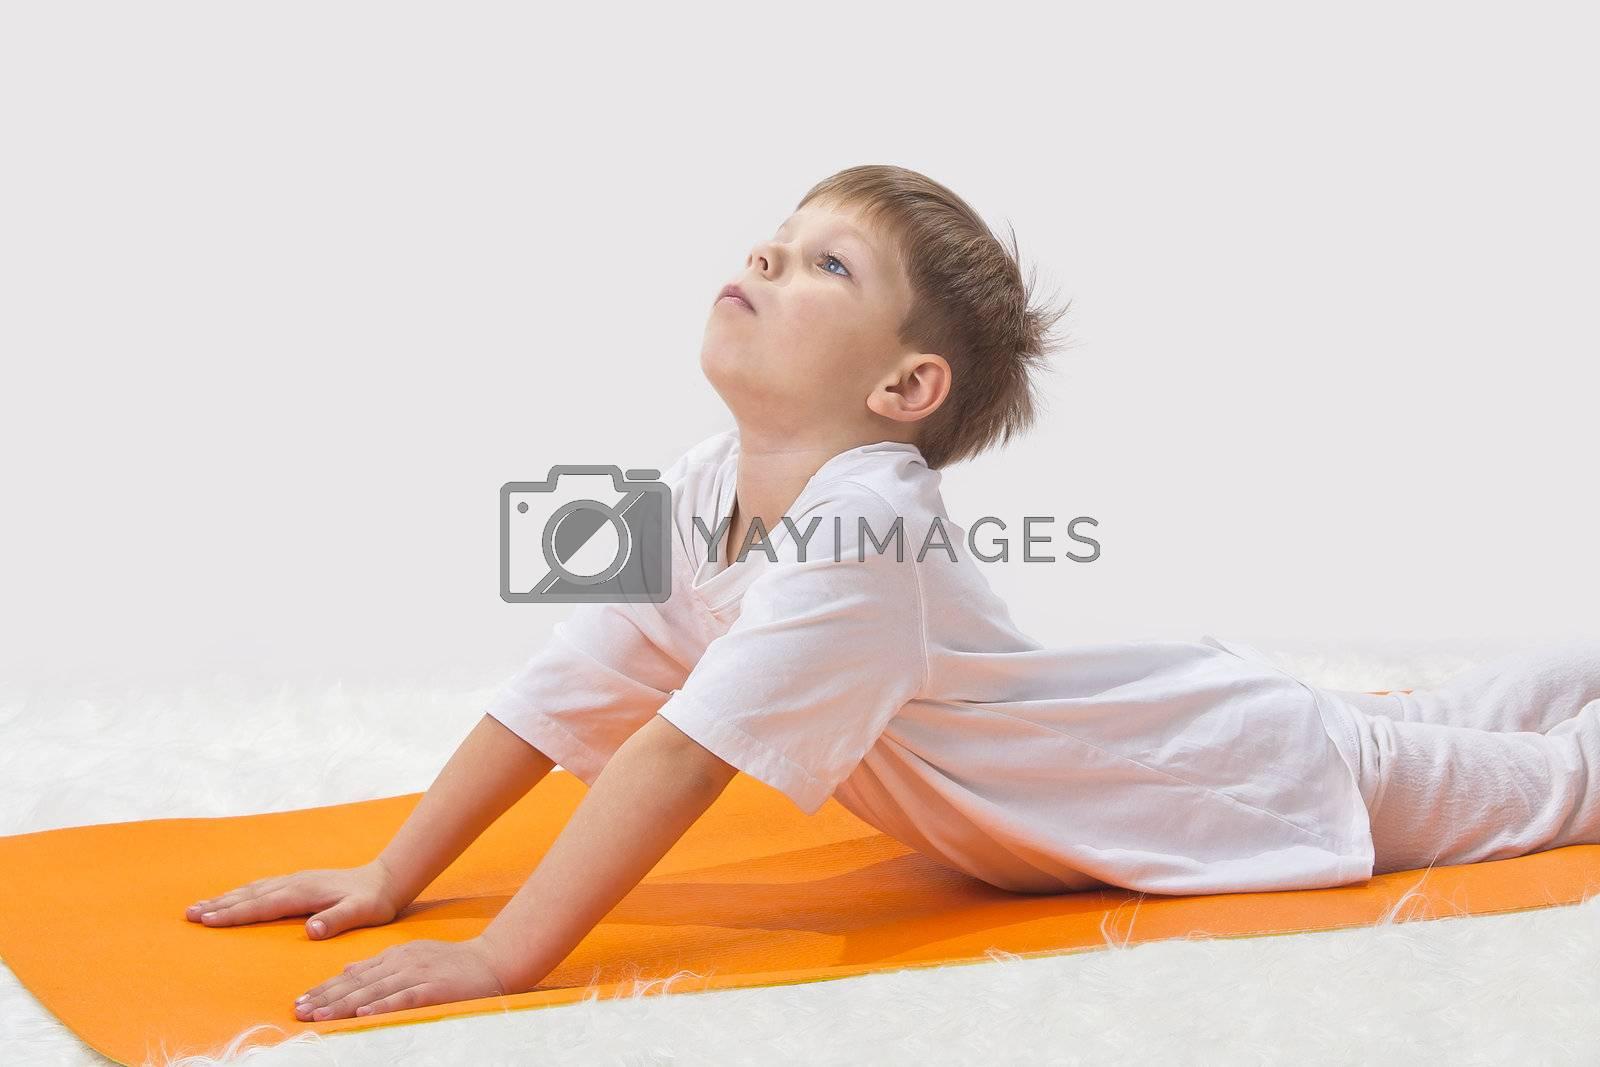 Children's yoga. The little boy does exercise.